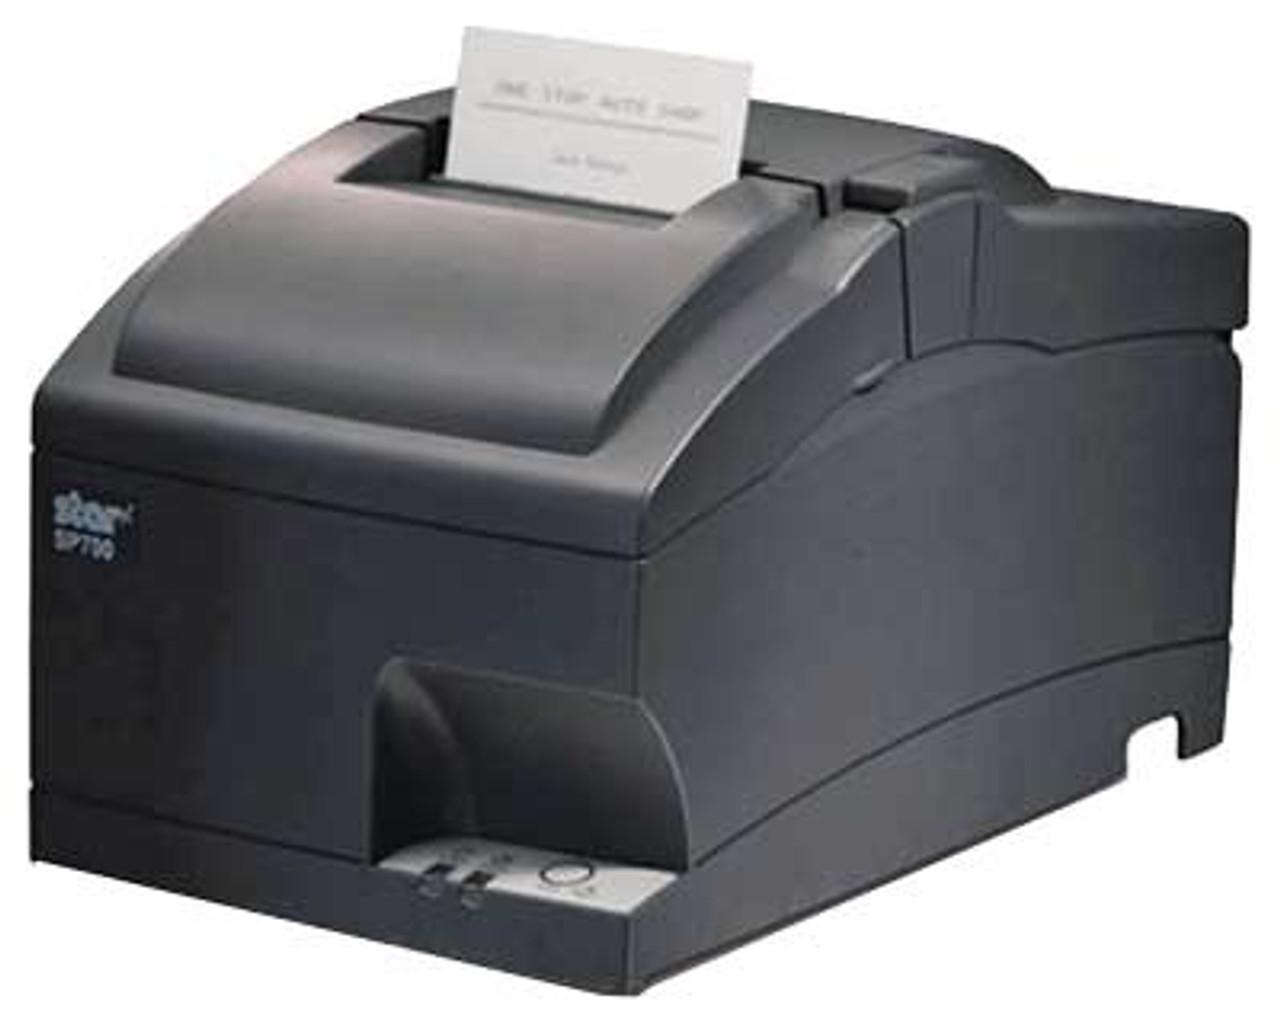 Star SP700 POS Receipt Printer, SP742MC-GRY, 39332110, Impact AUTO CUTTER